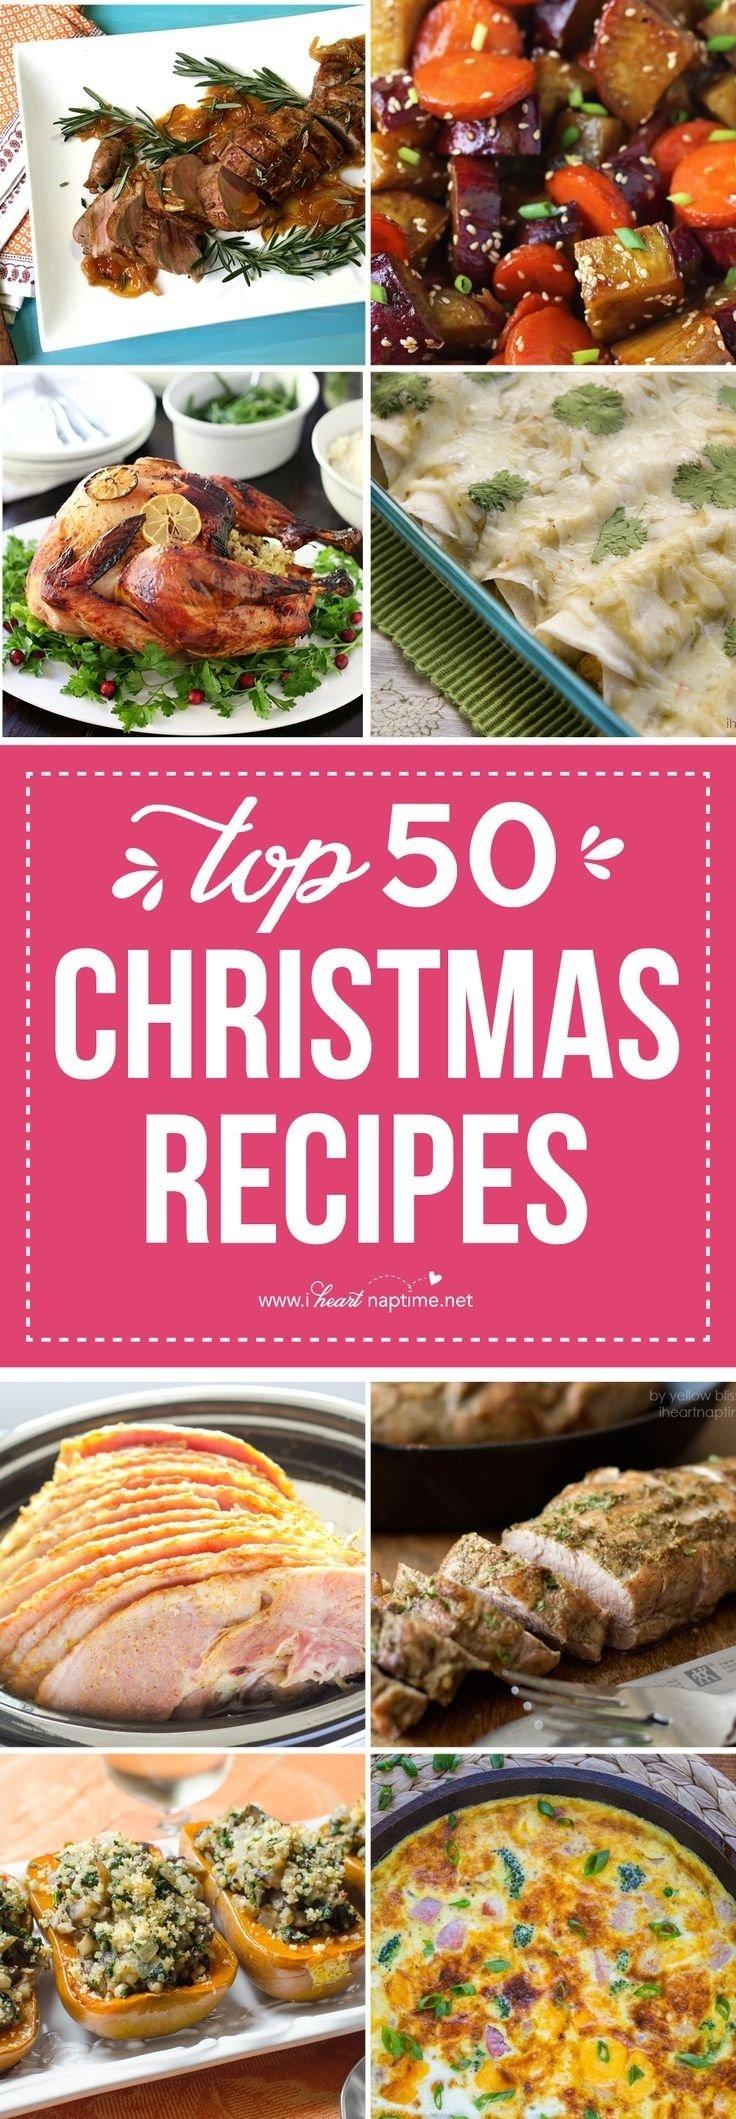 10 beautiful southern christmas dinner menu ideas - Southern Christmas Dinner Menu Ideas